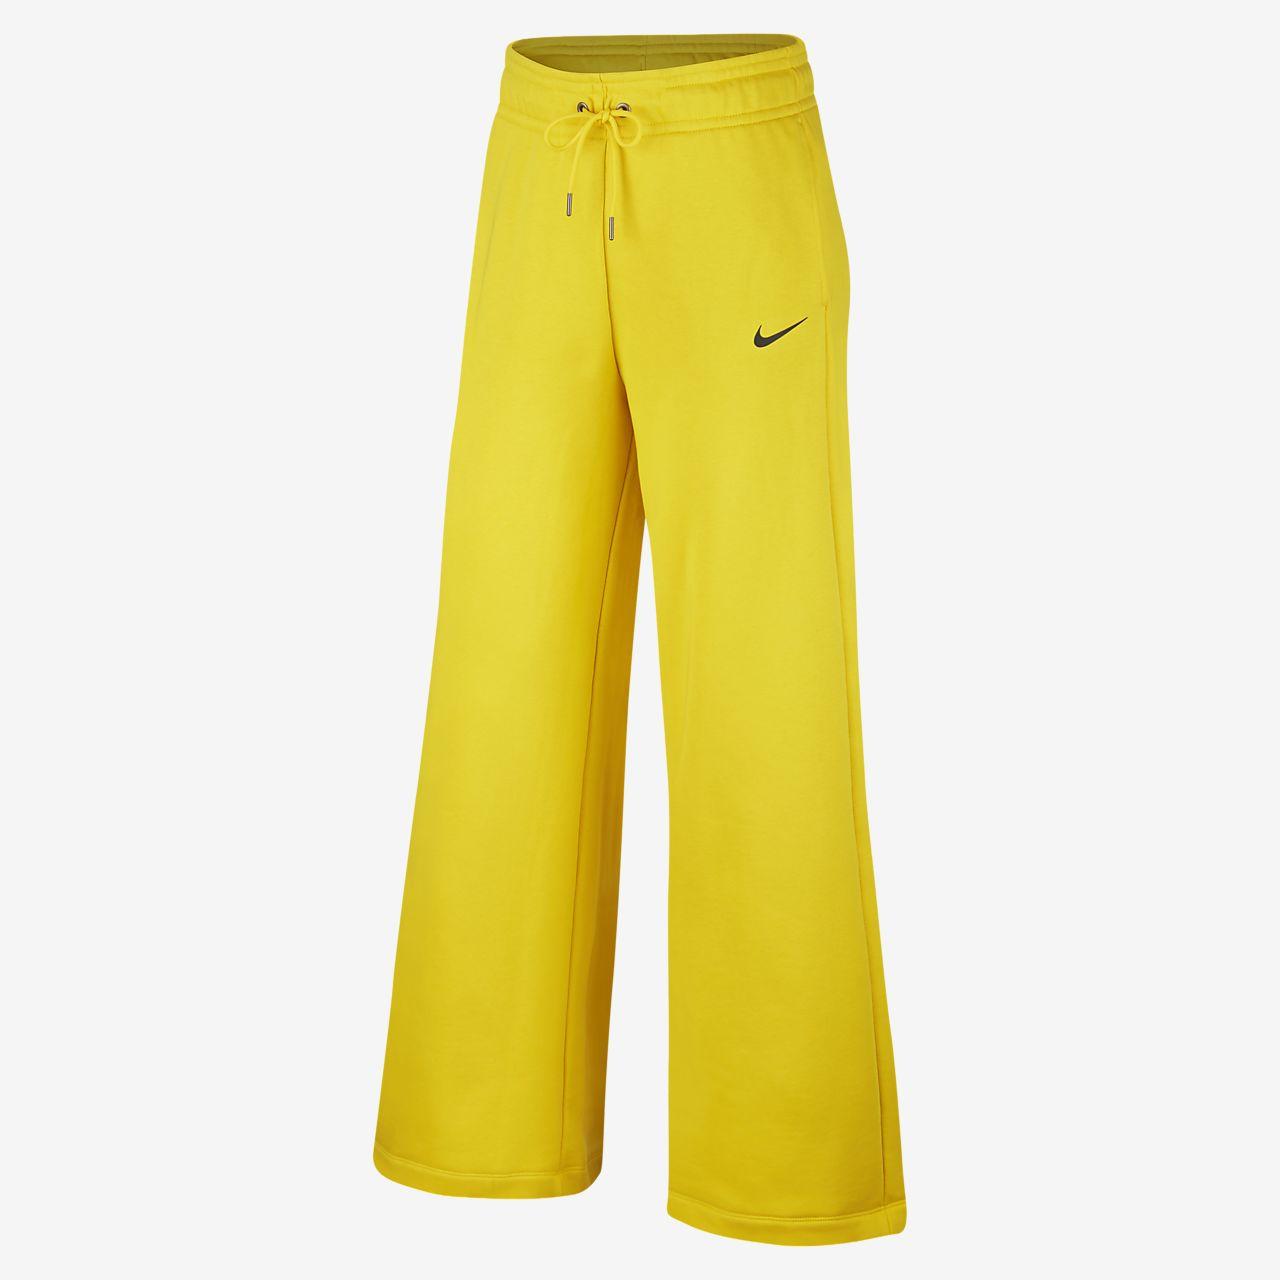 Nike Sportswear Pantalons amb camals amples - Dona